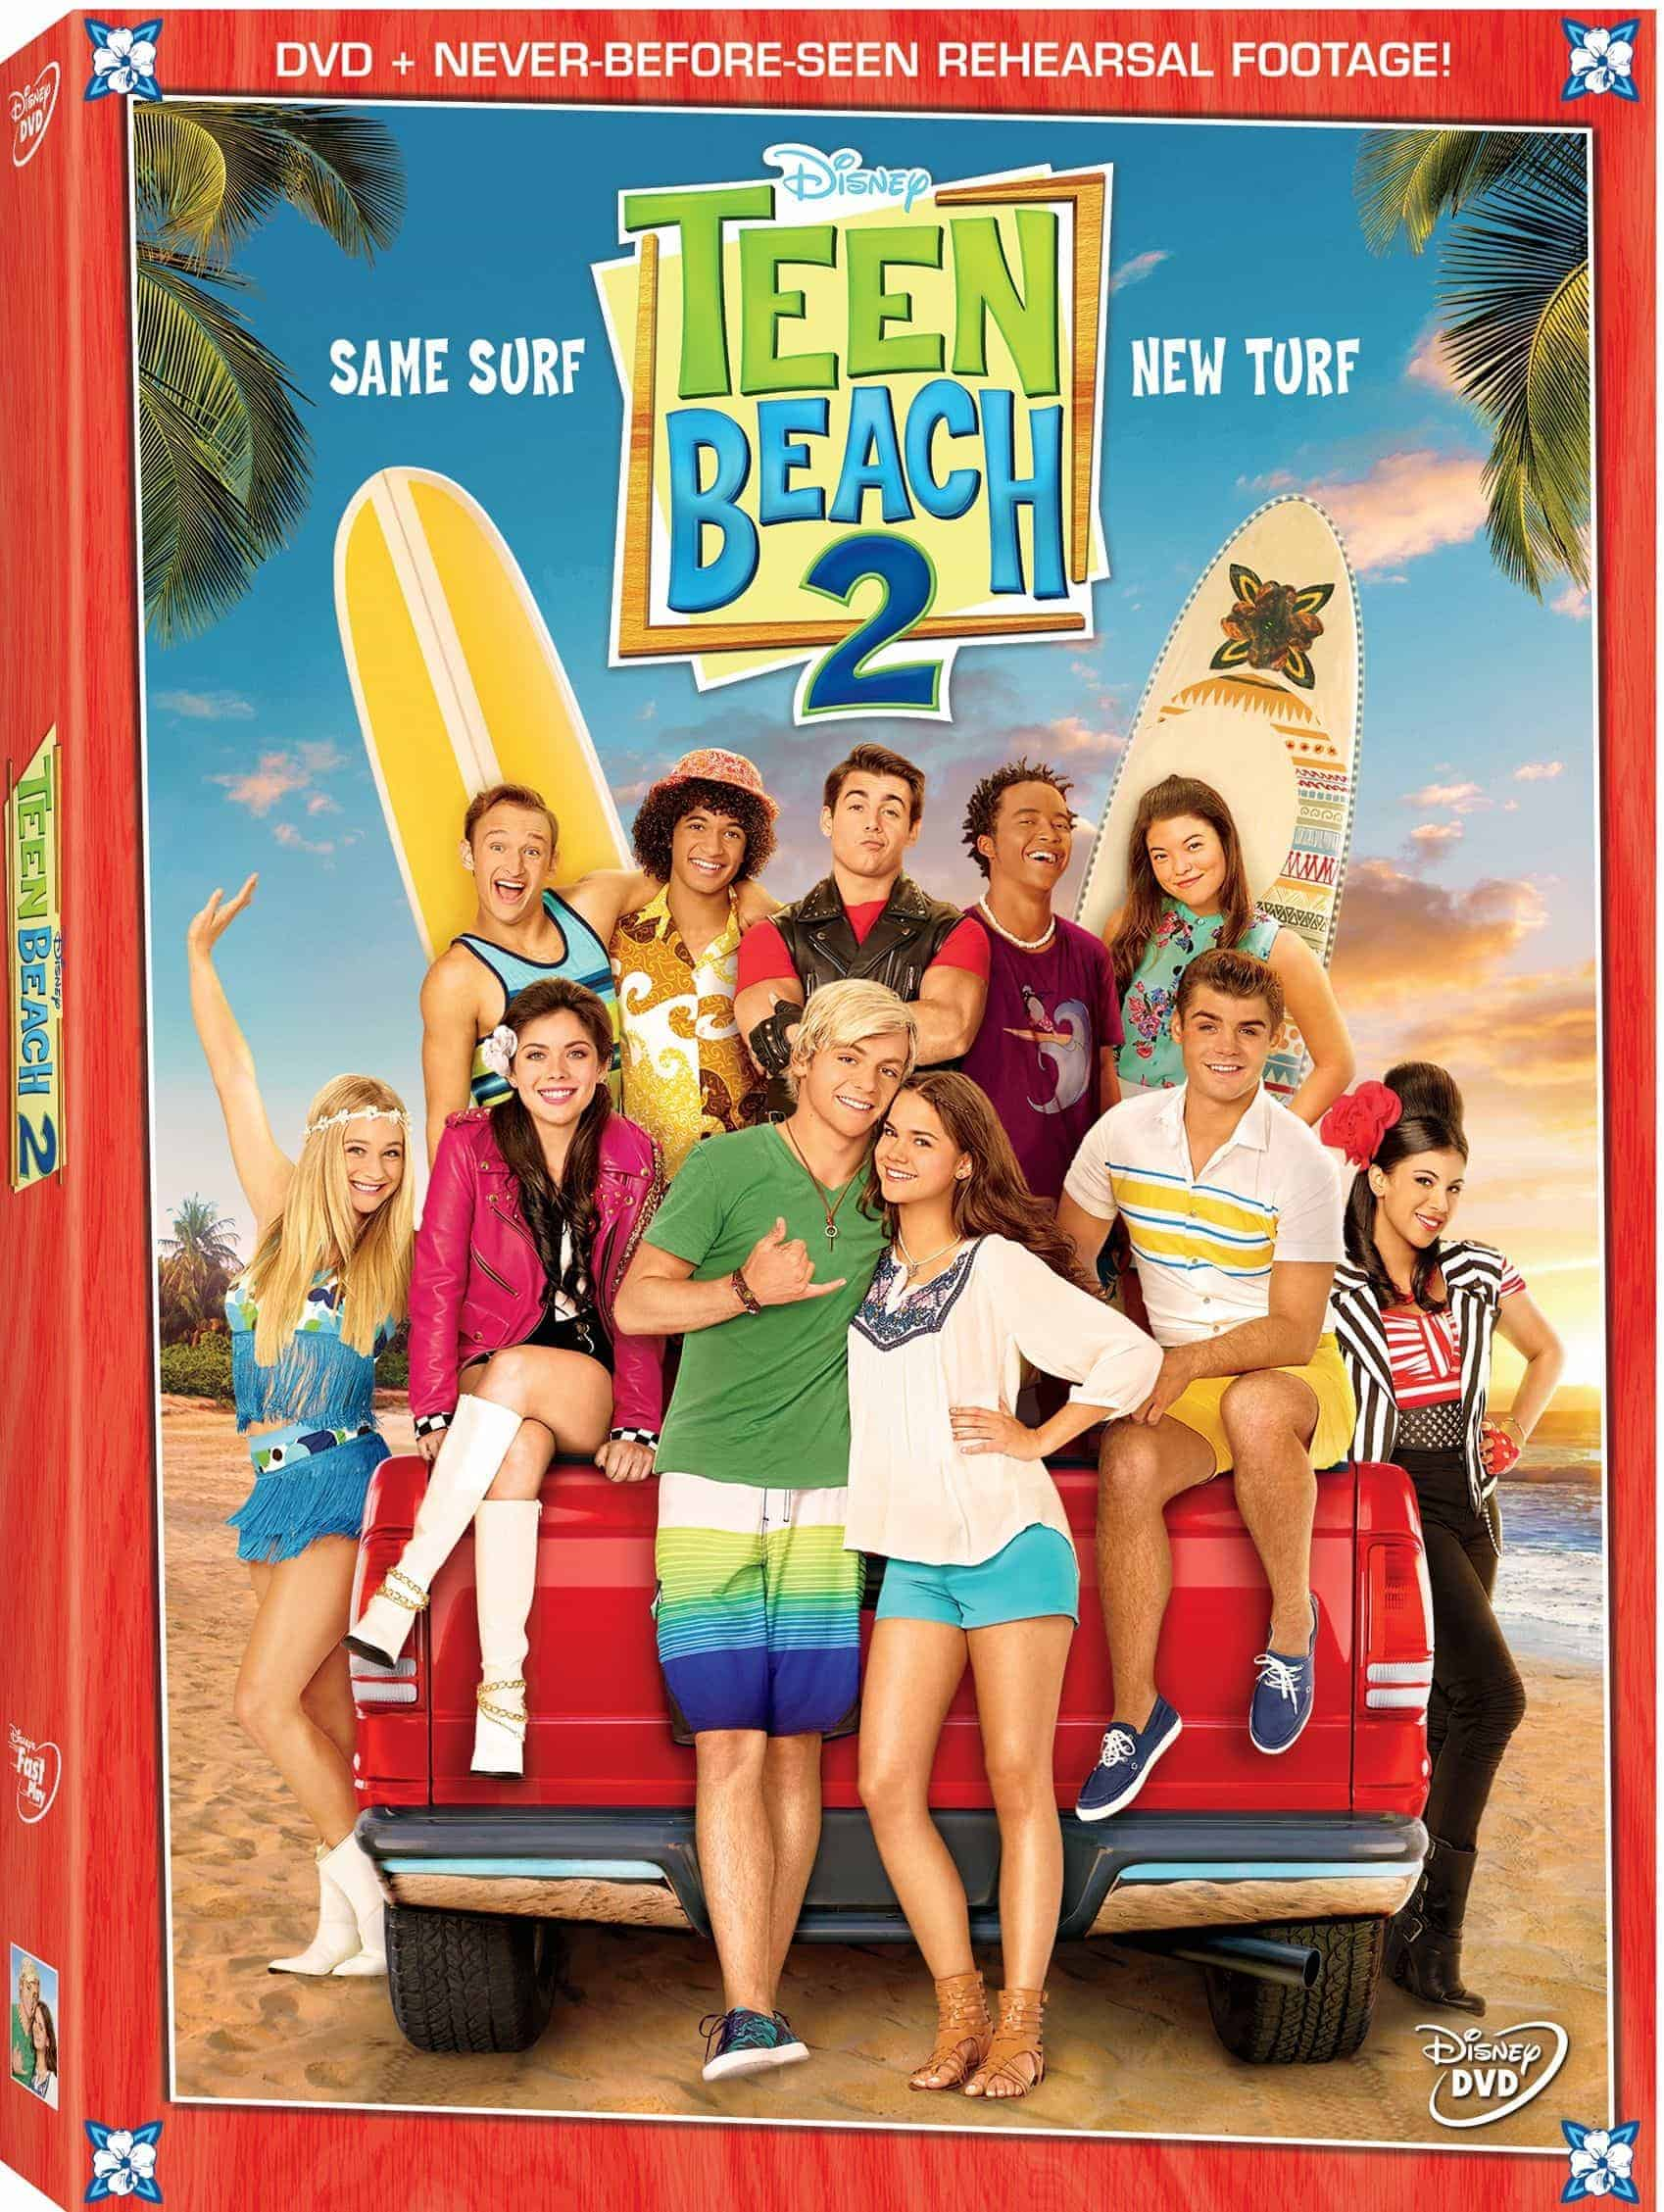 Teen Beach 2 Coming to DVD June 26